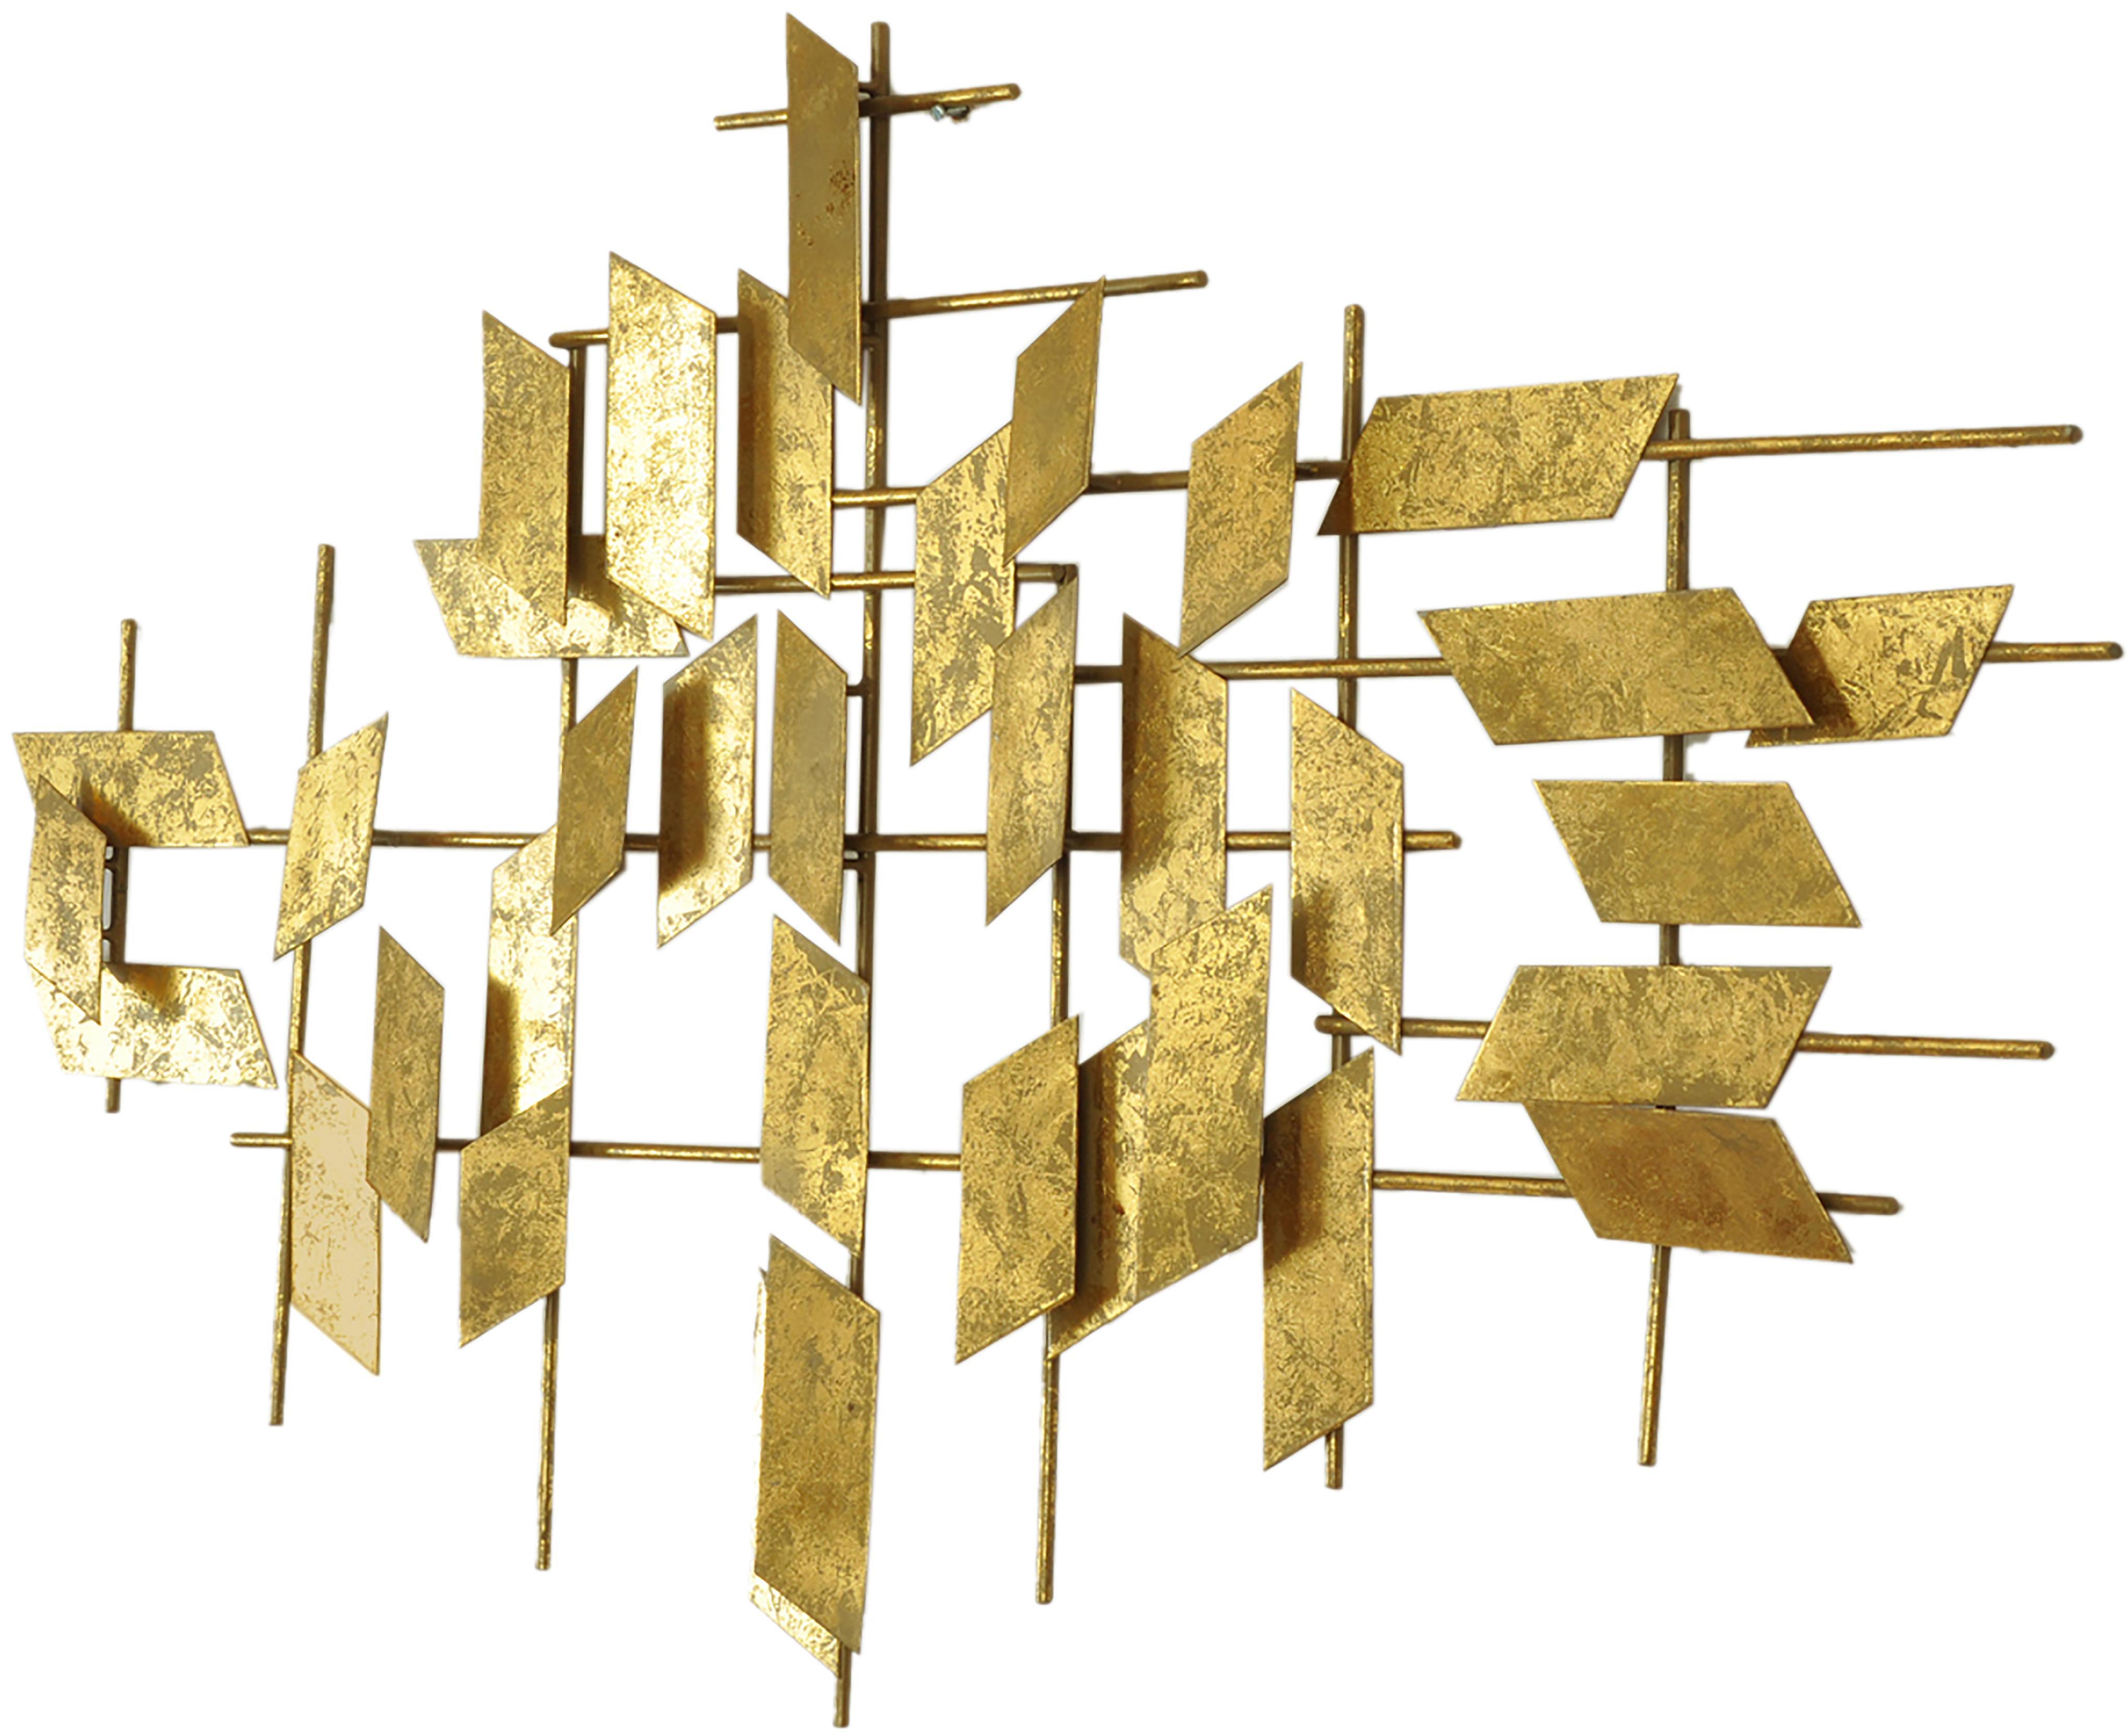 XL-Wandobjekt Tara aus Metall, Metall, Goldfarben, 95 x 60 cm